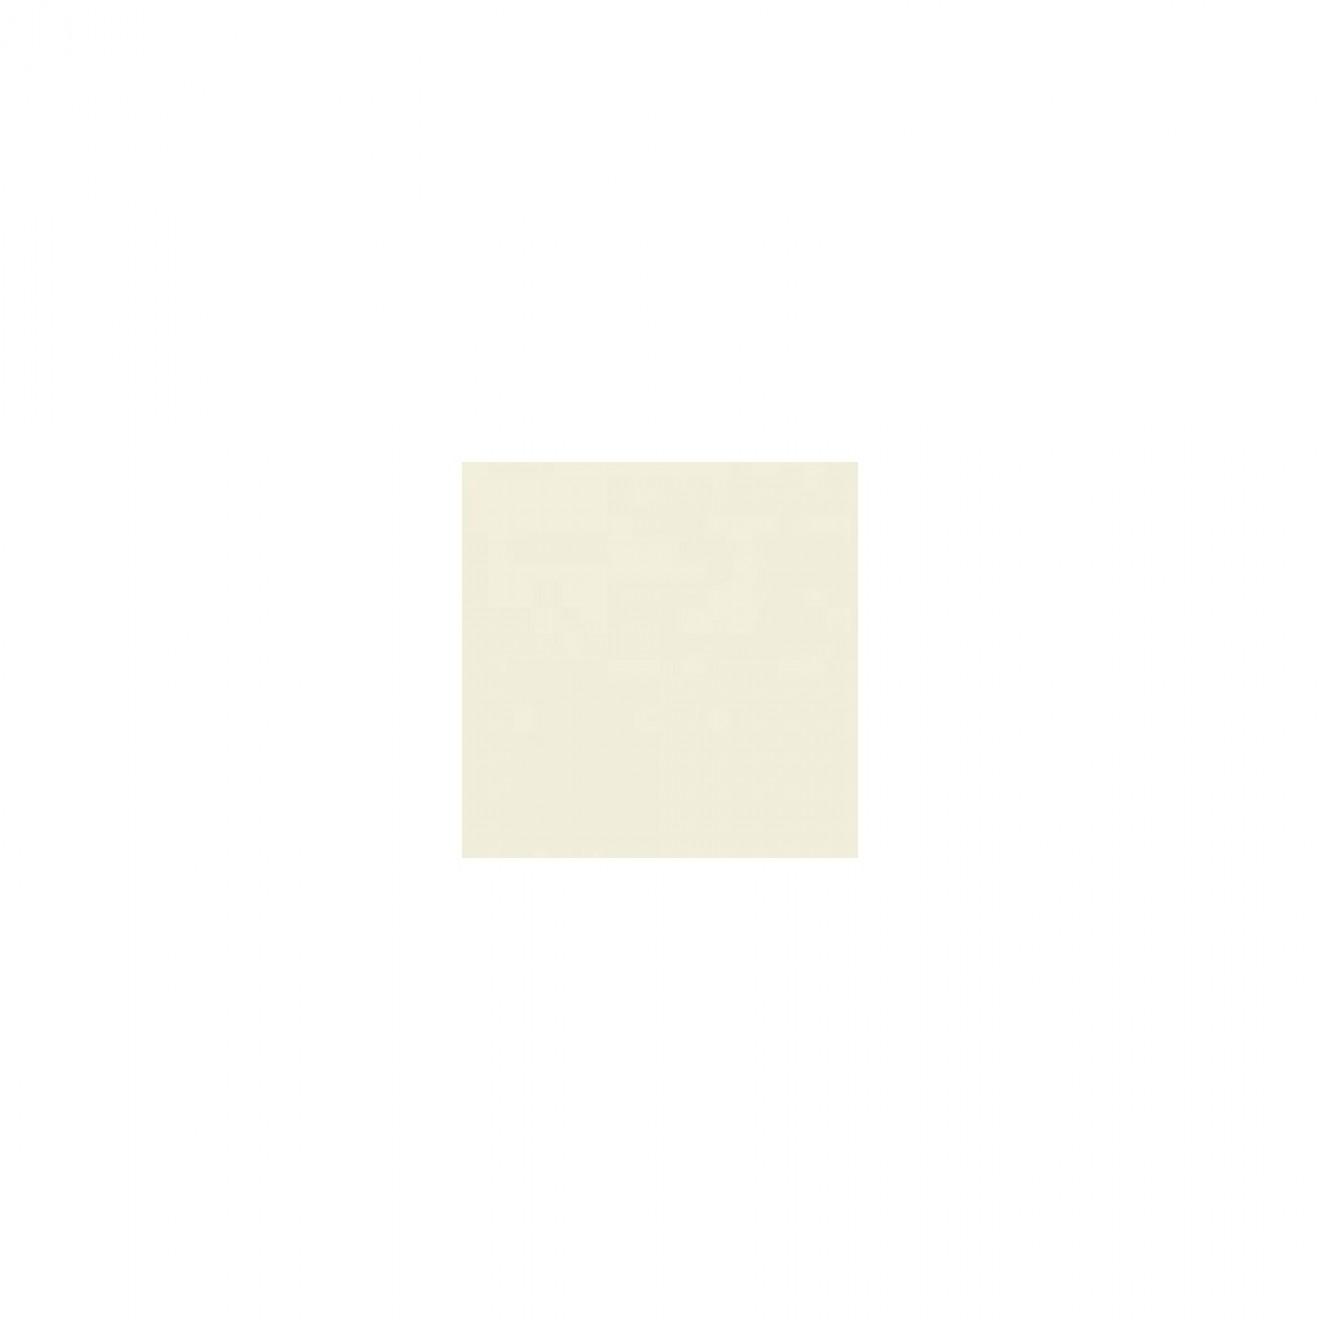 vinyplus st lpprofil fassaden kaufen fassadenverkleidungen klinker fassaden. Black Bedroom Furniture Sets. Home Design Ideas